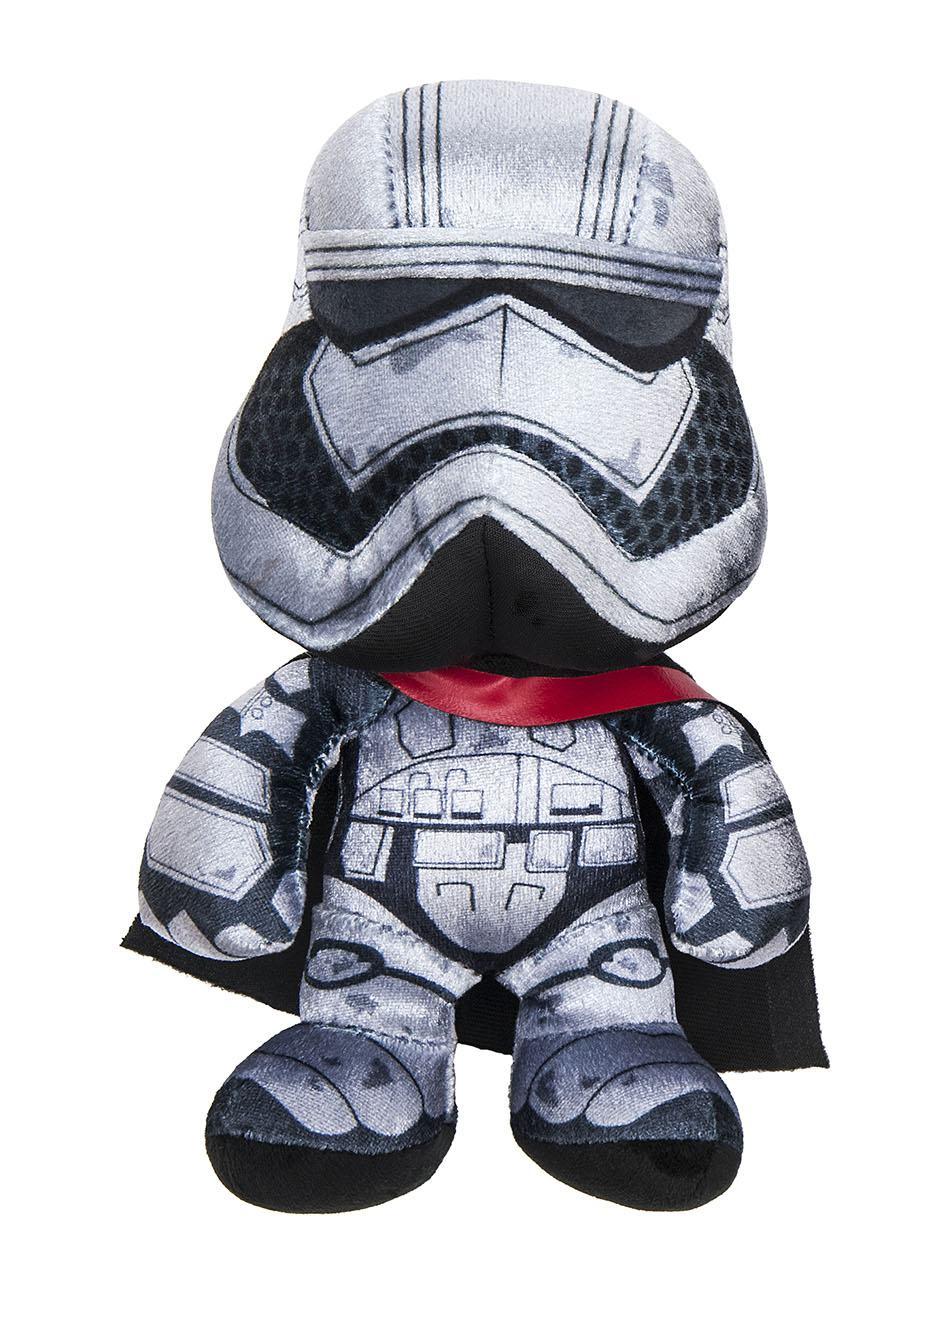 Star Wars Episode VII Plush Figure Captain Phasma 17 cm